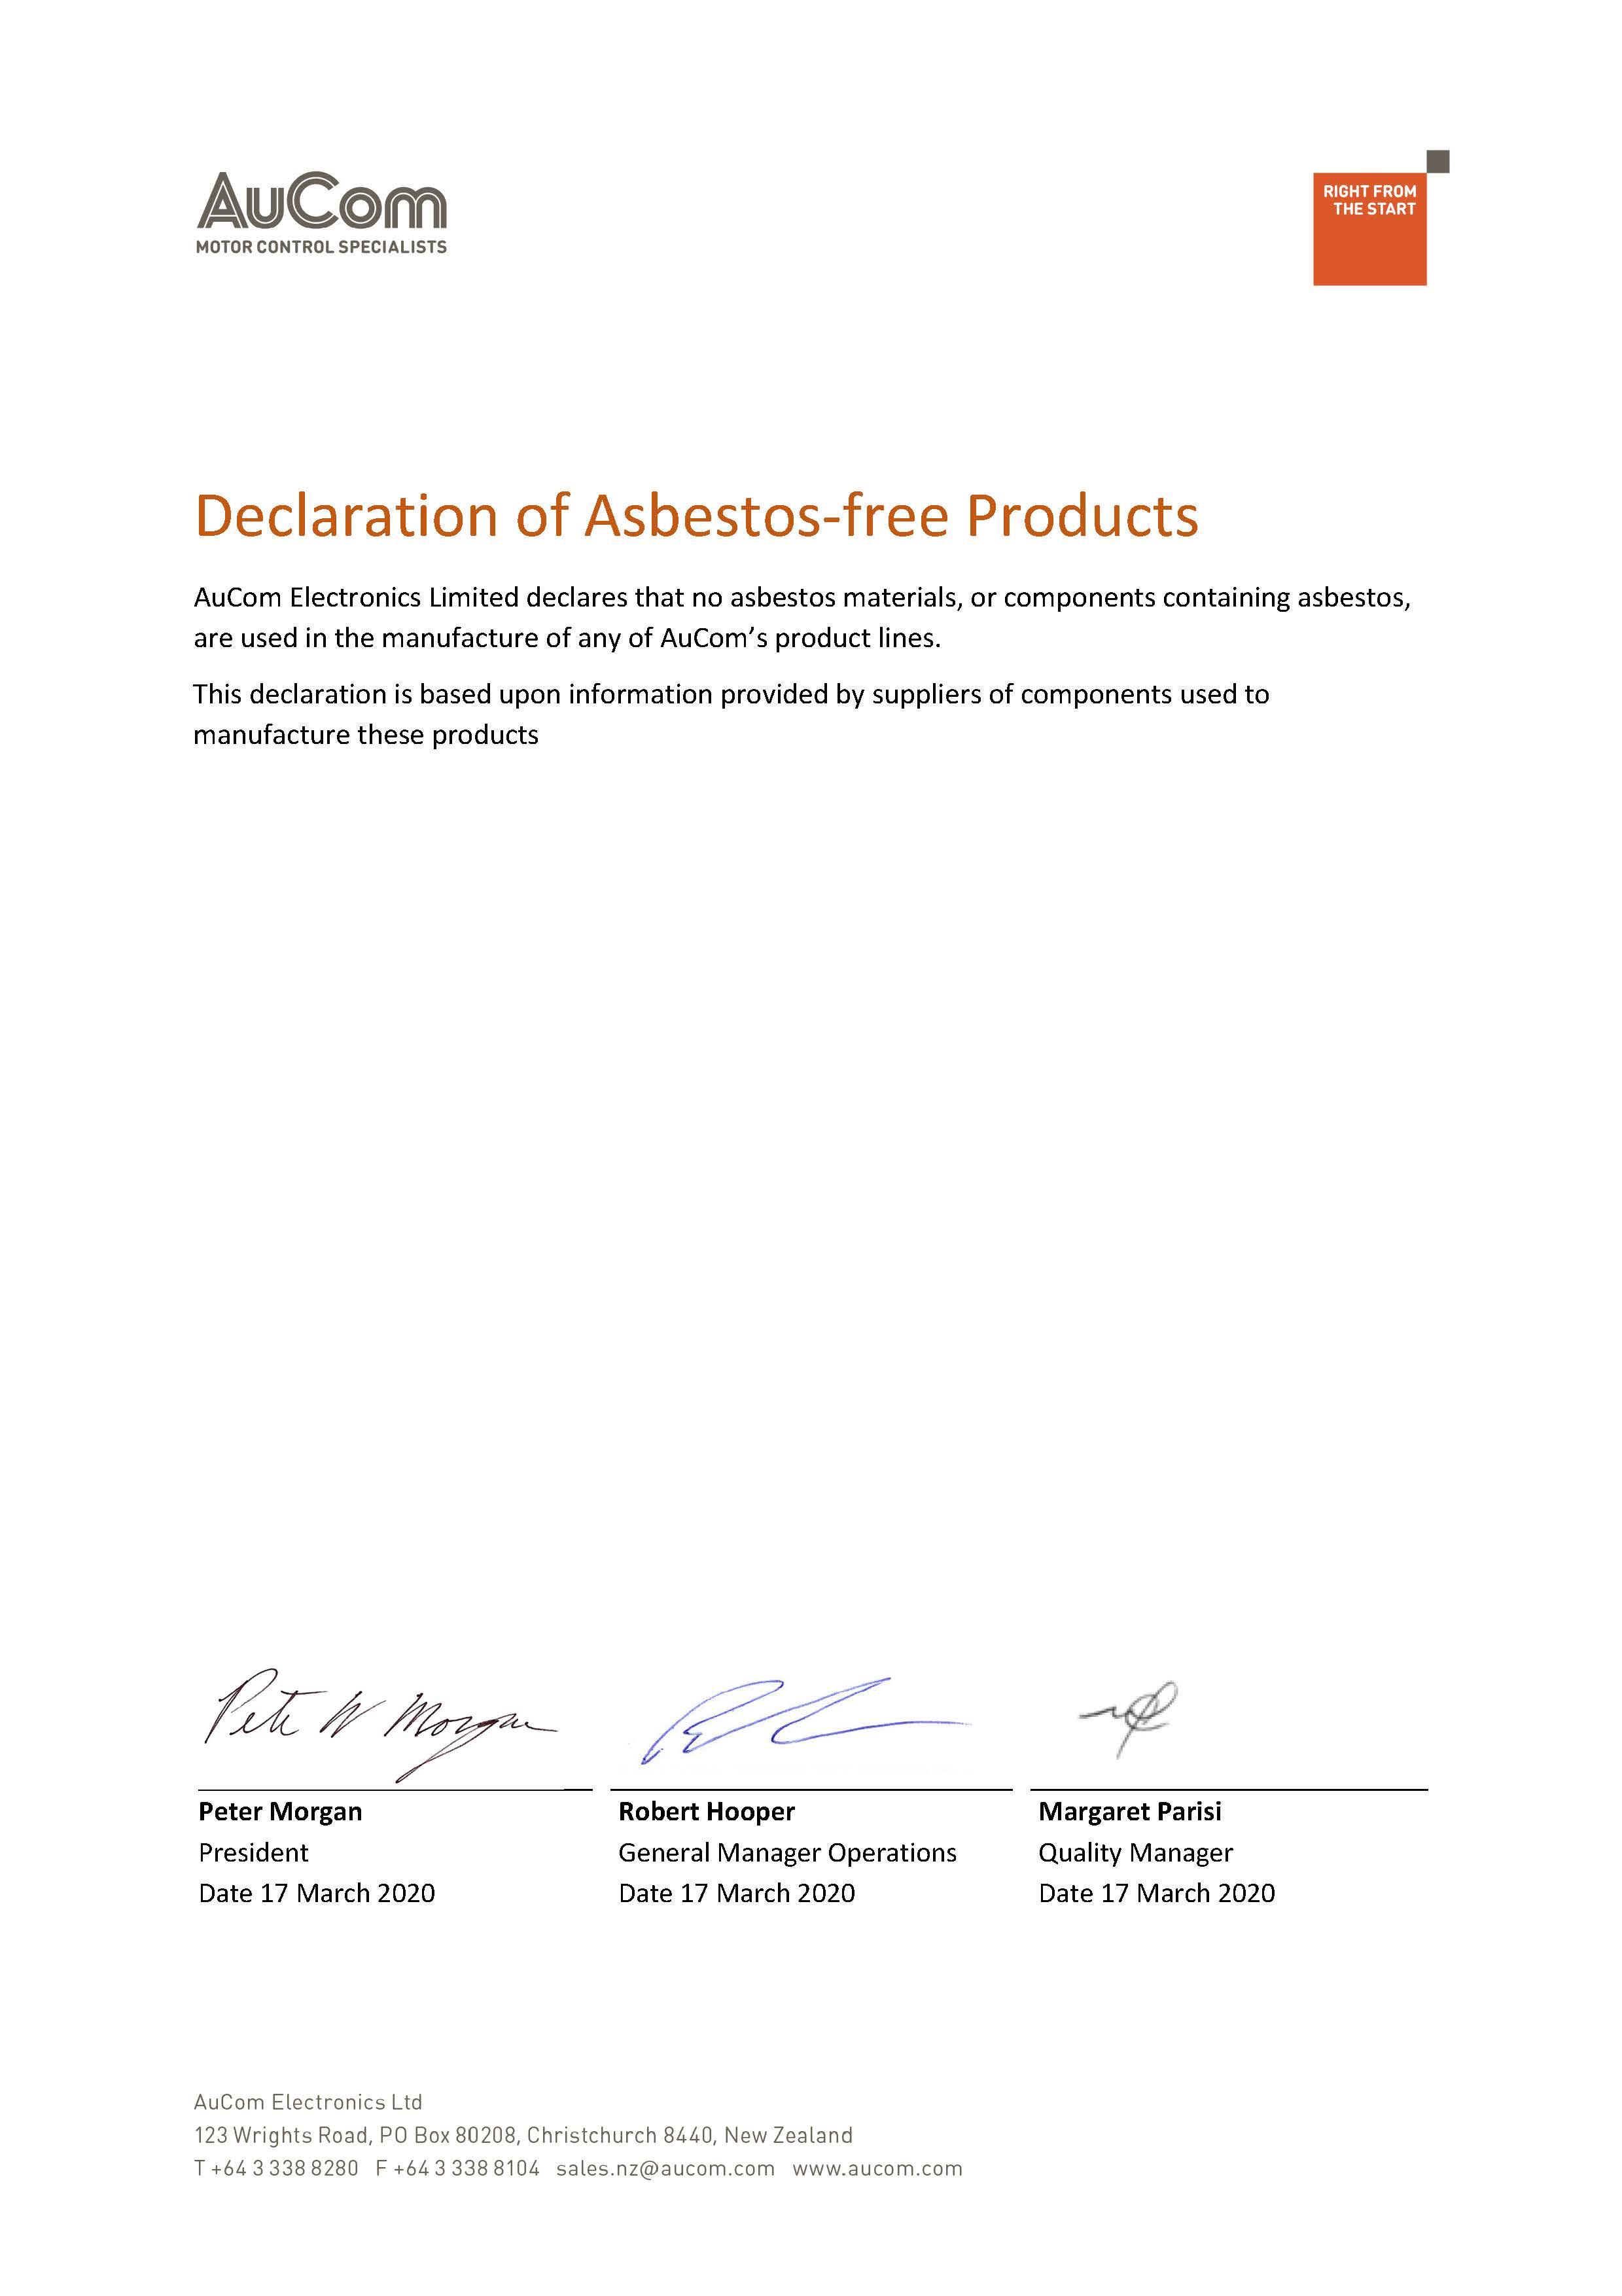 Inspirational images of asbestos certification business cards certification from asbestos certification image source aucom xflitez Choice Image